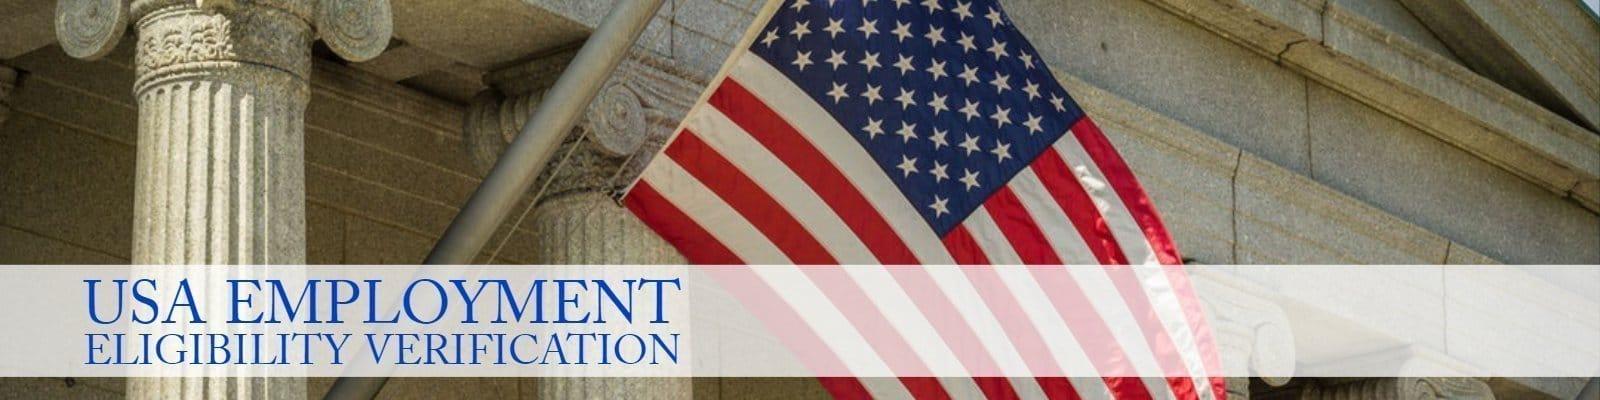 USA employment verification form, pharmacy compliance, pharmacy regulatory compliance